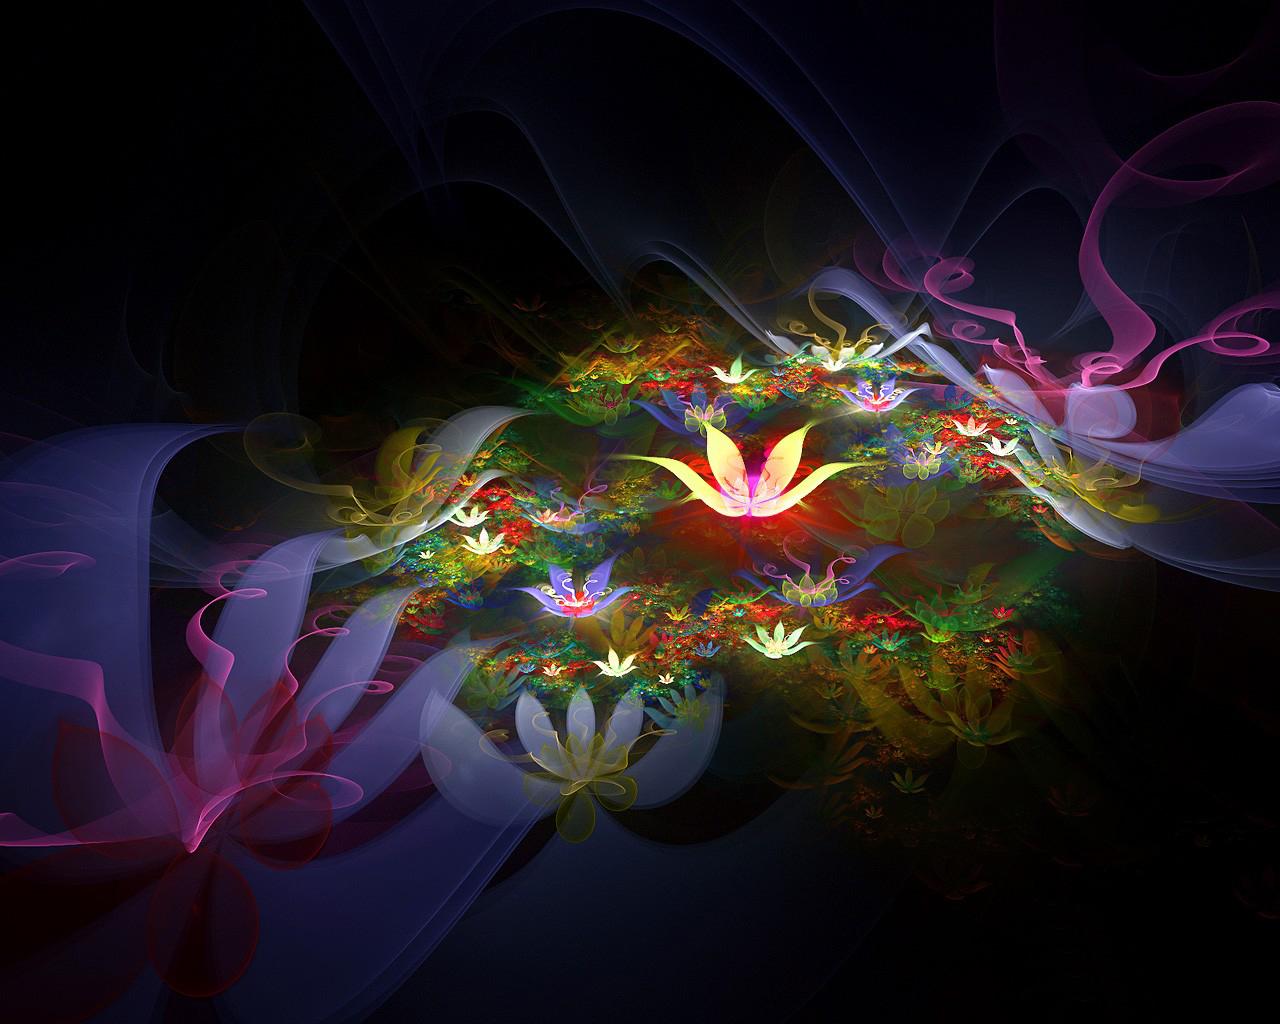 3d flower high resolution wallpapers download Fine 1280x1024